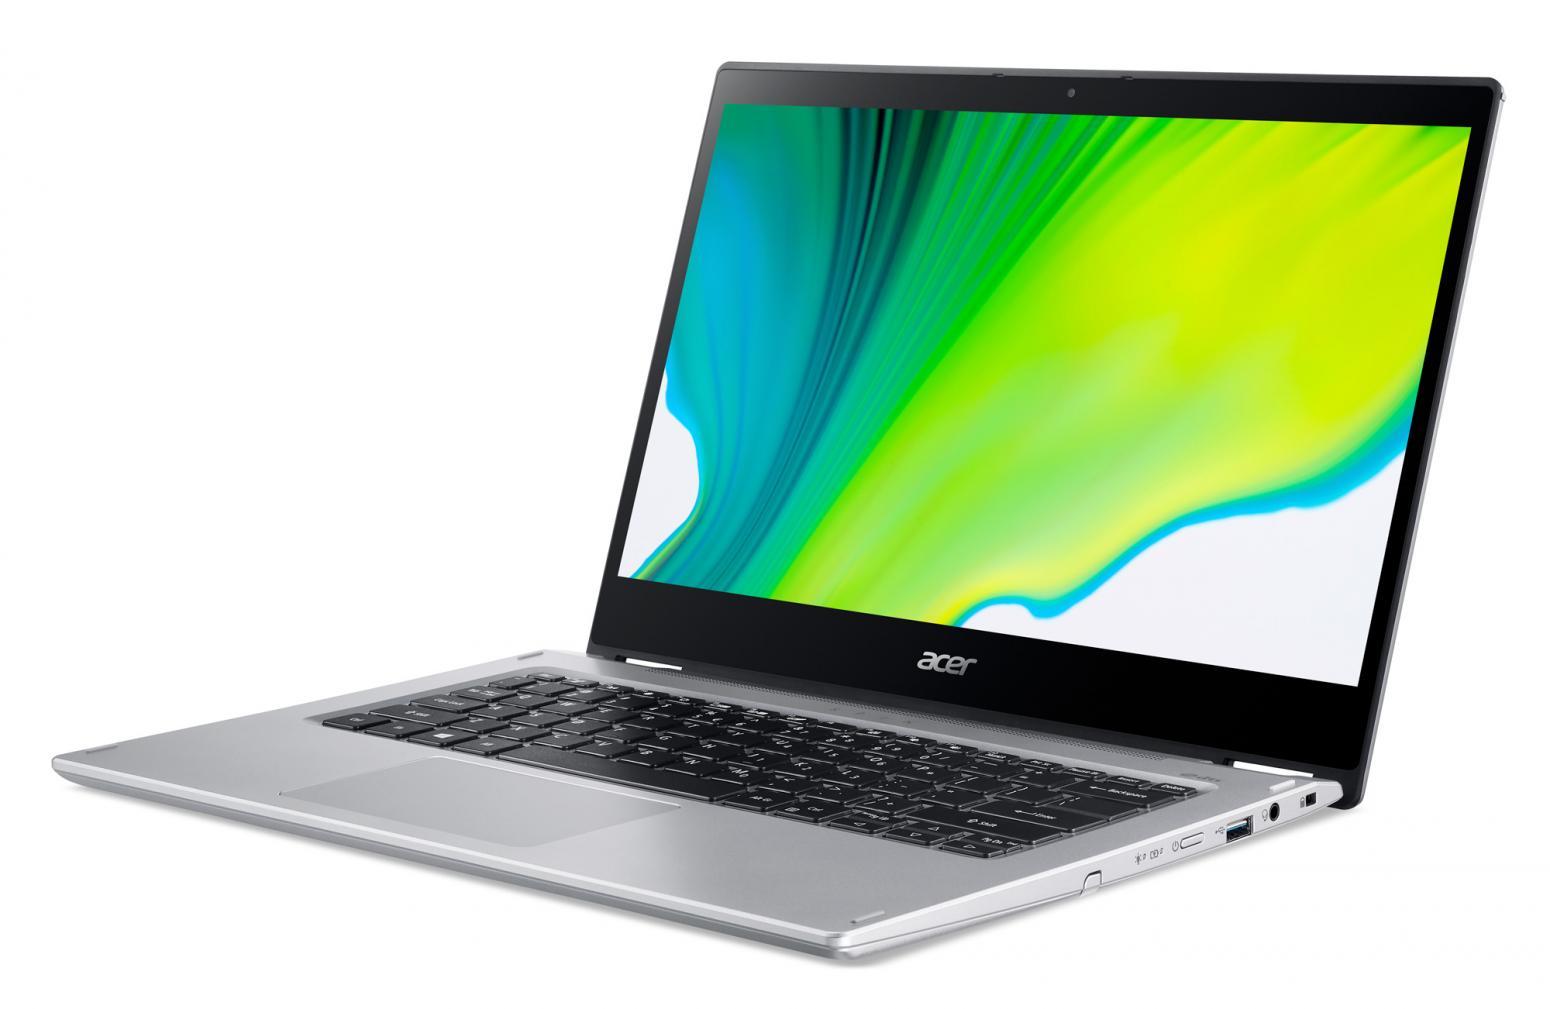 Ordinateur portable Acer Spin 3 SP314-54N-52H9 Argent - Tactile, Stylet - photo 4